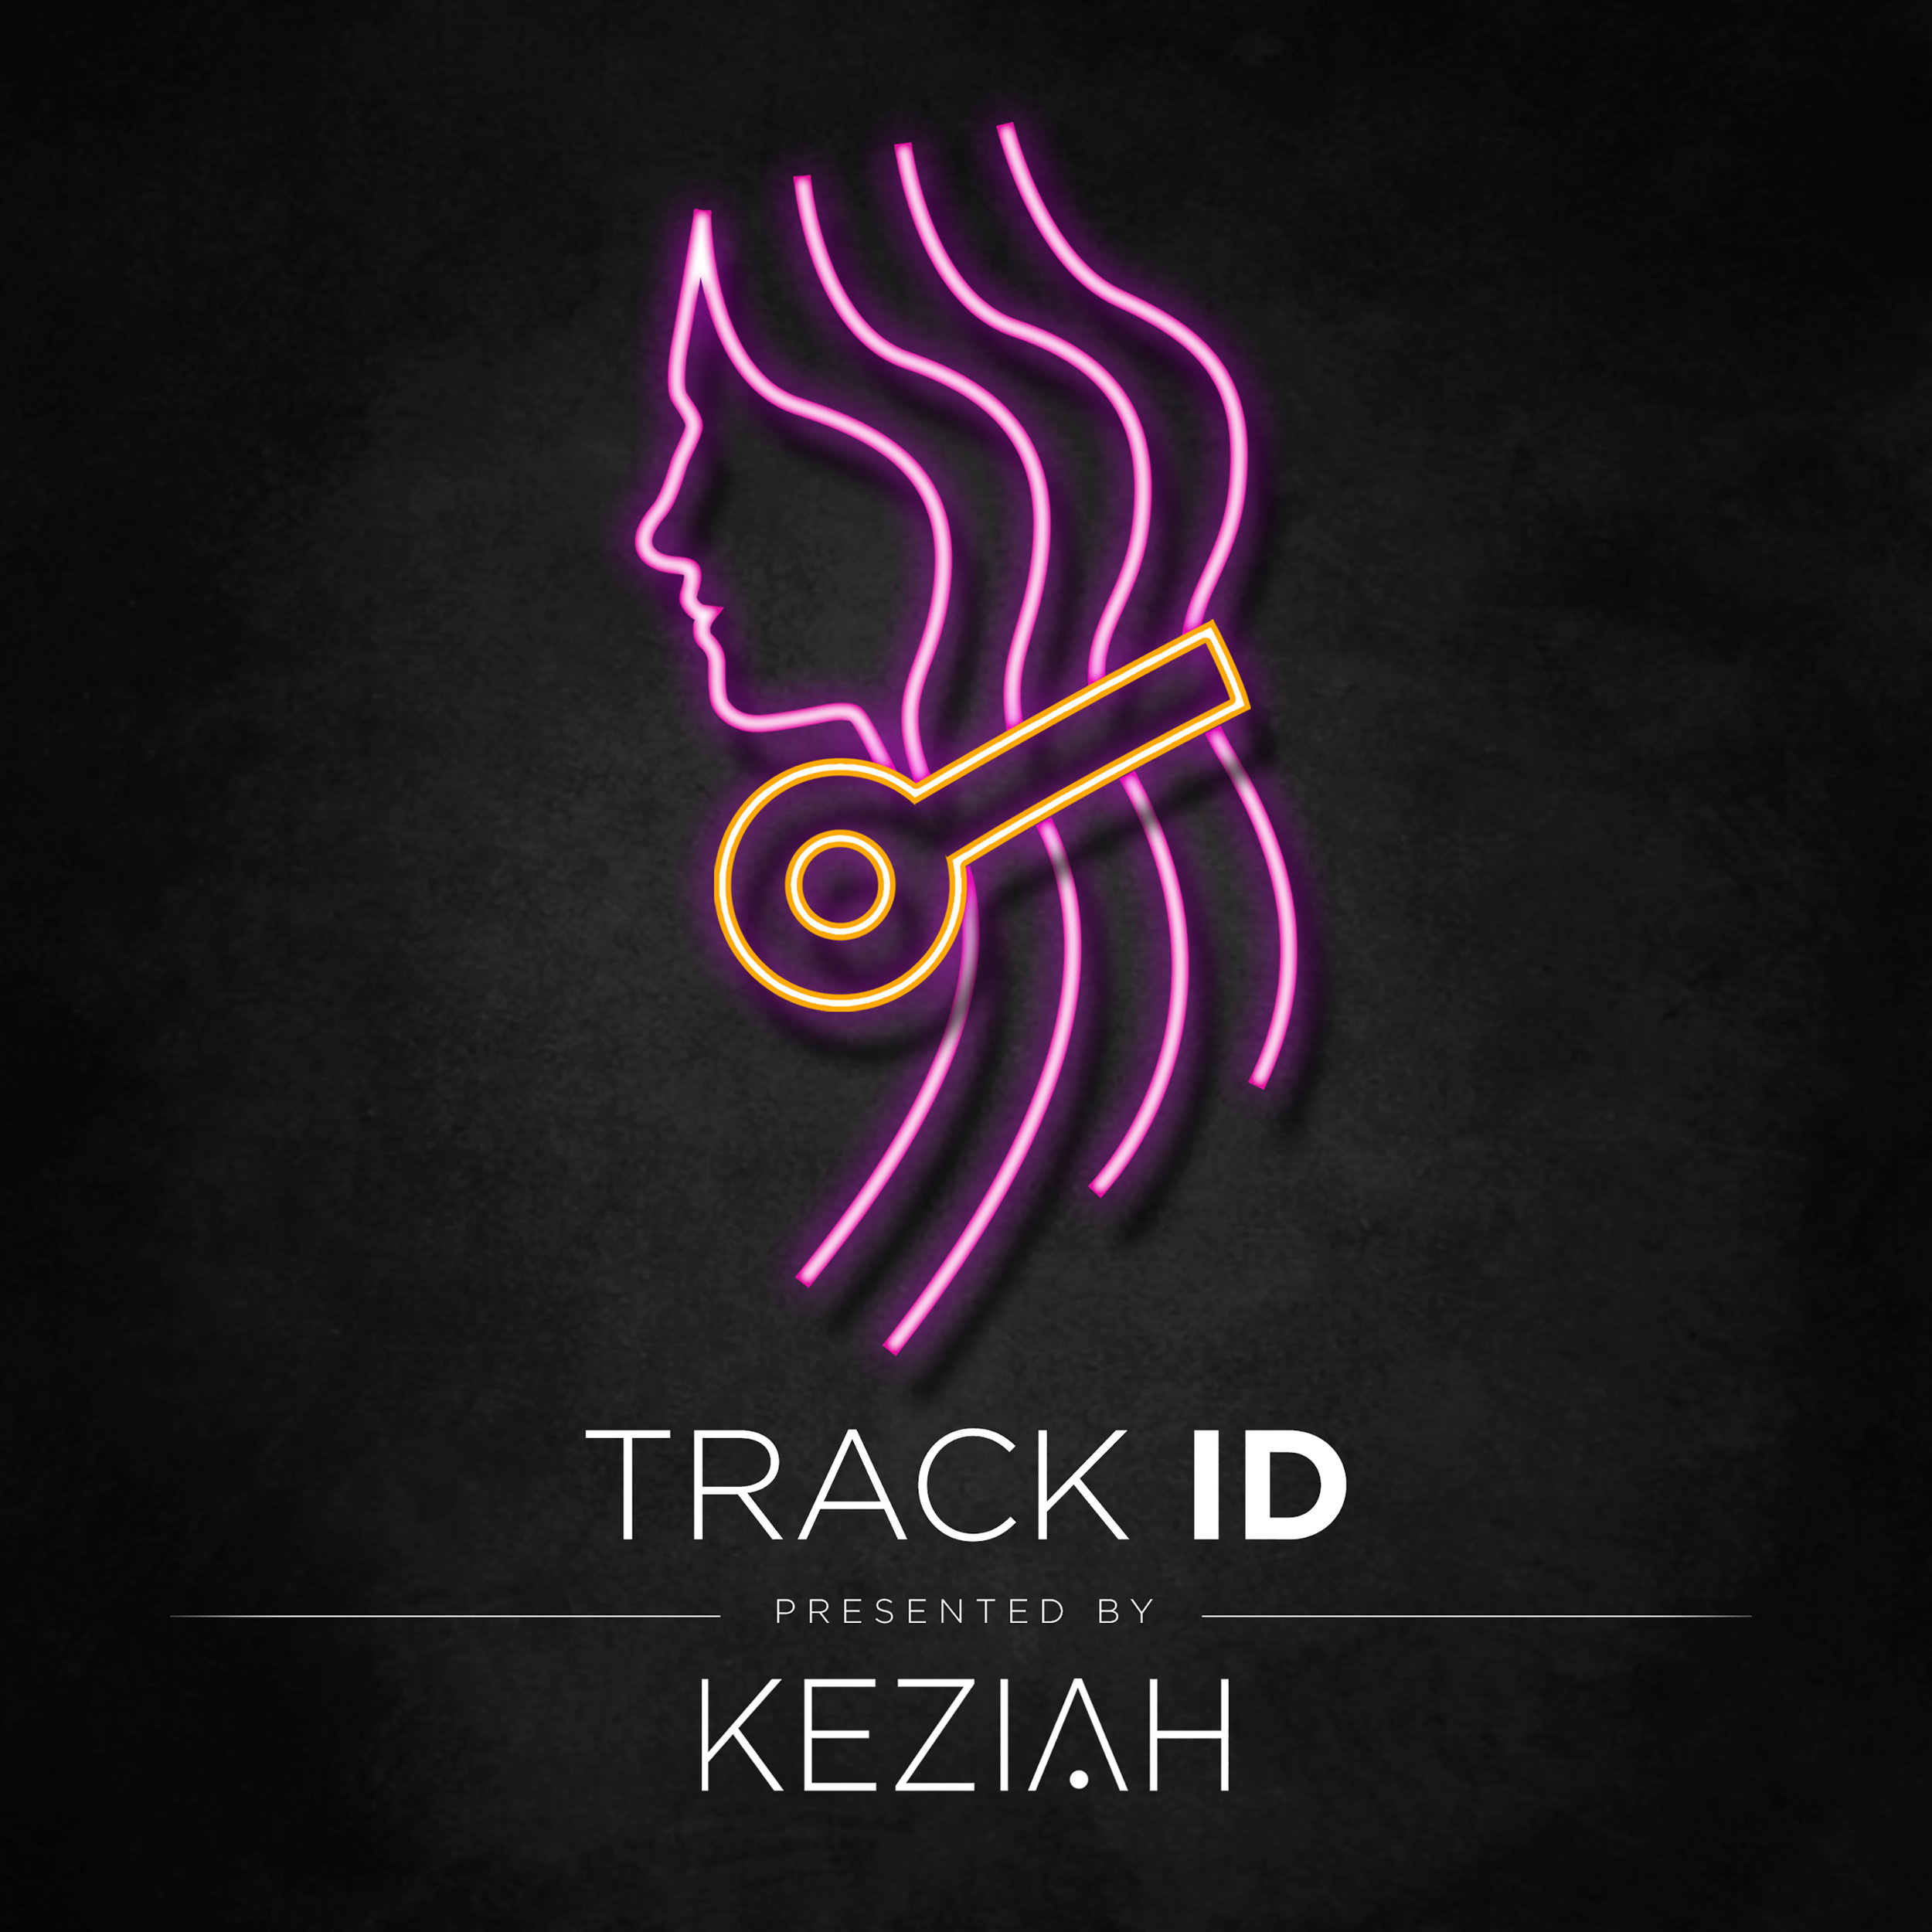 Track ID by Keziah copy.jpg